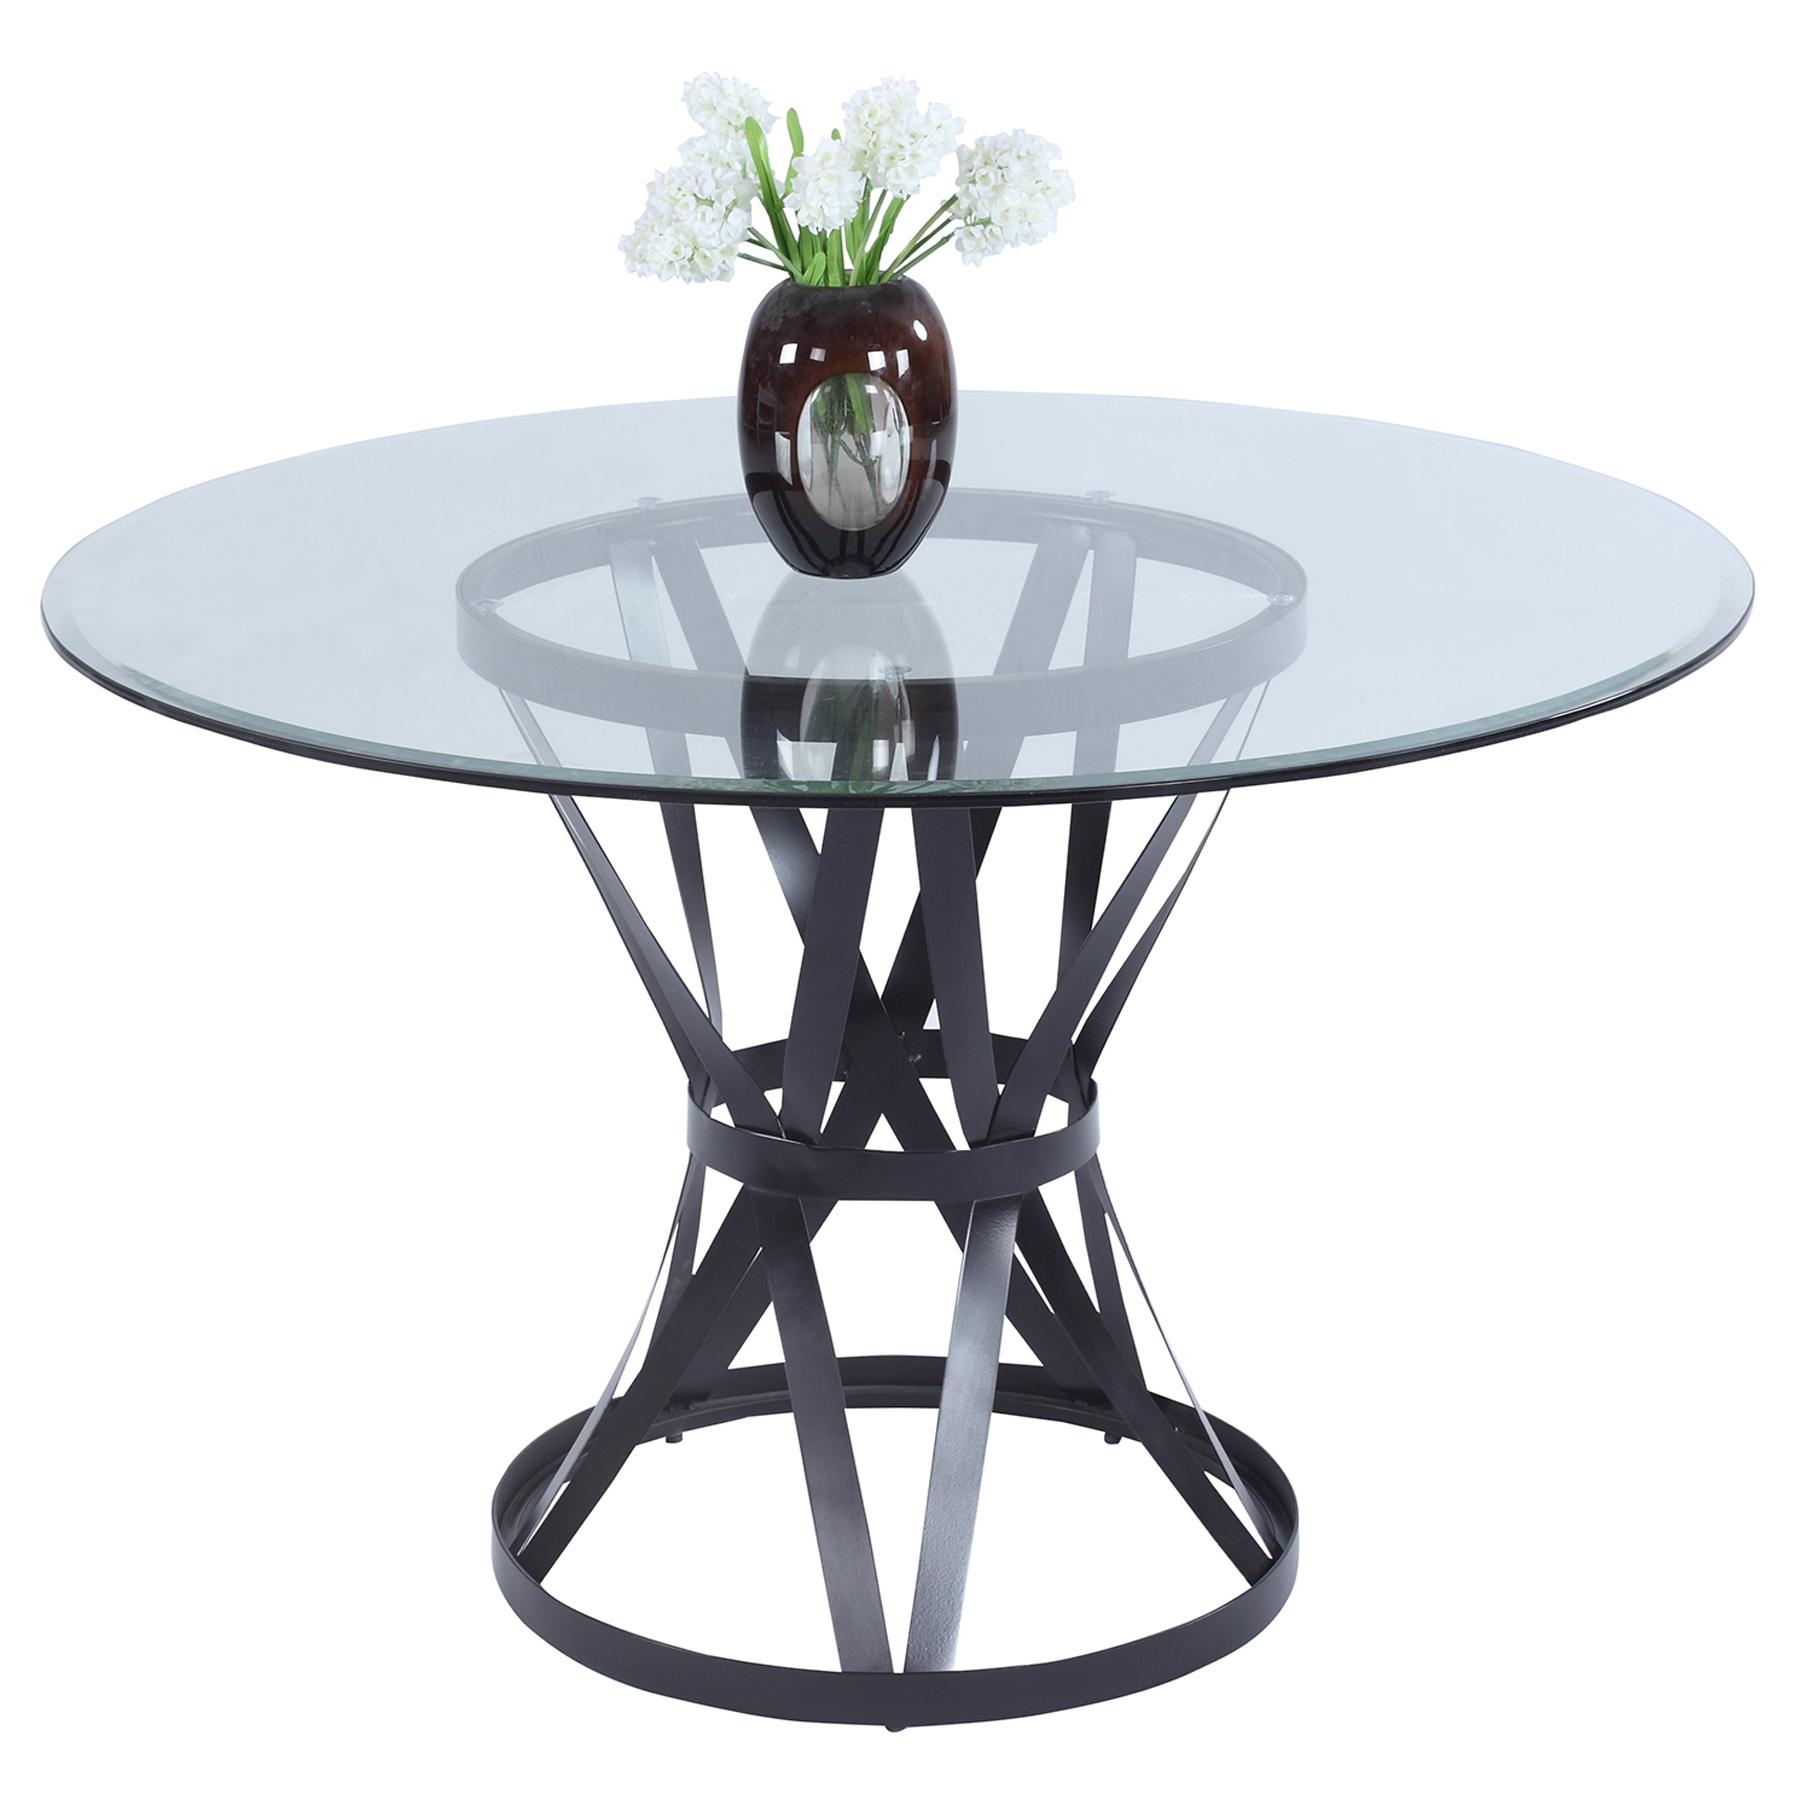 Pandora Round Dining Table Glass Top Matt Black Base  : pandora dt from www.dcgstores.com size 500 x 500 jpeg 85kB